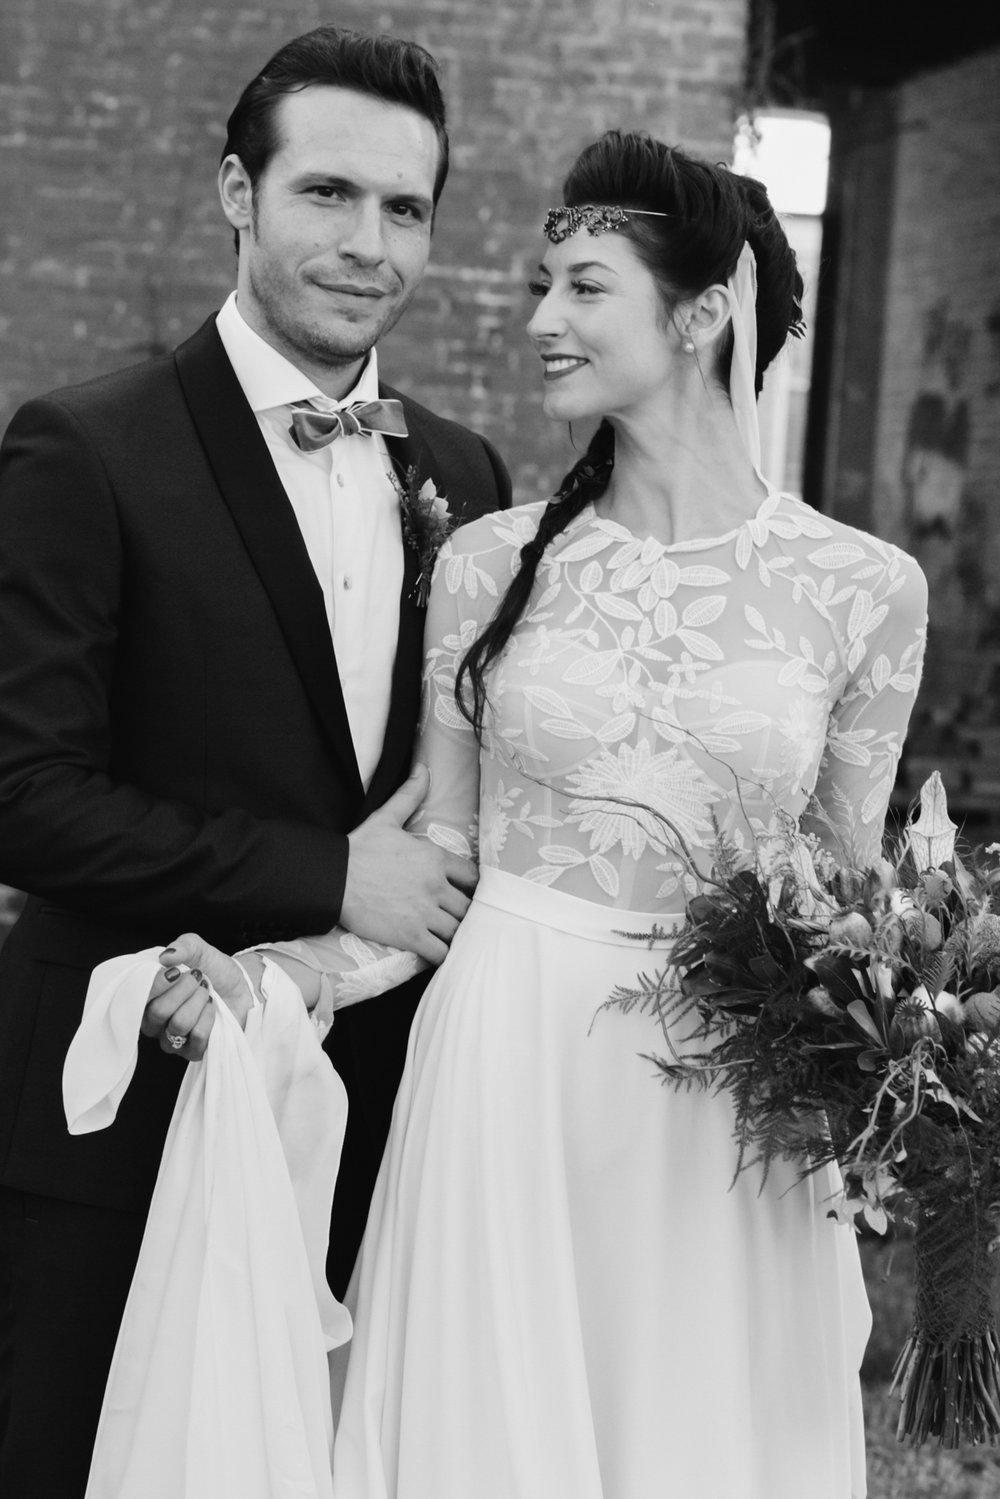 Kimberly-Coccagnia-Wedding-Photographer-132.JPG